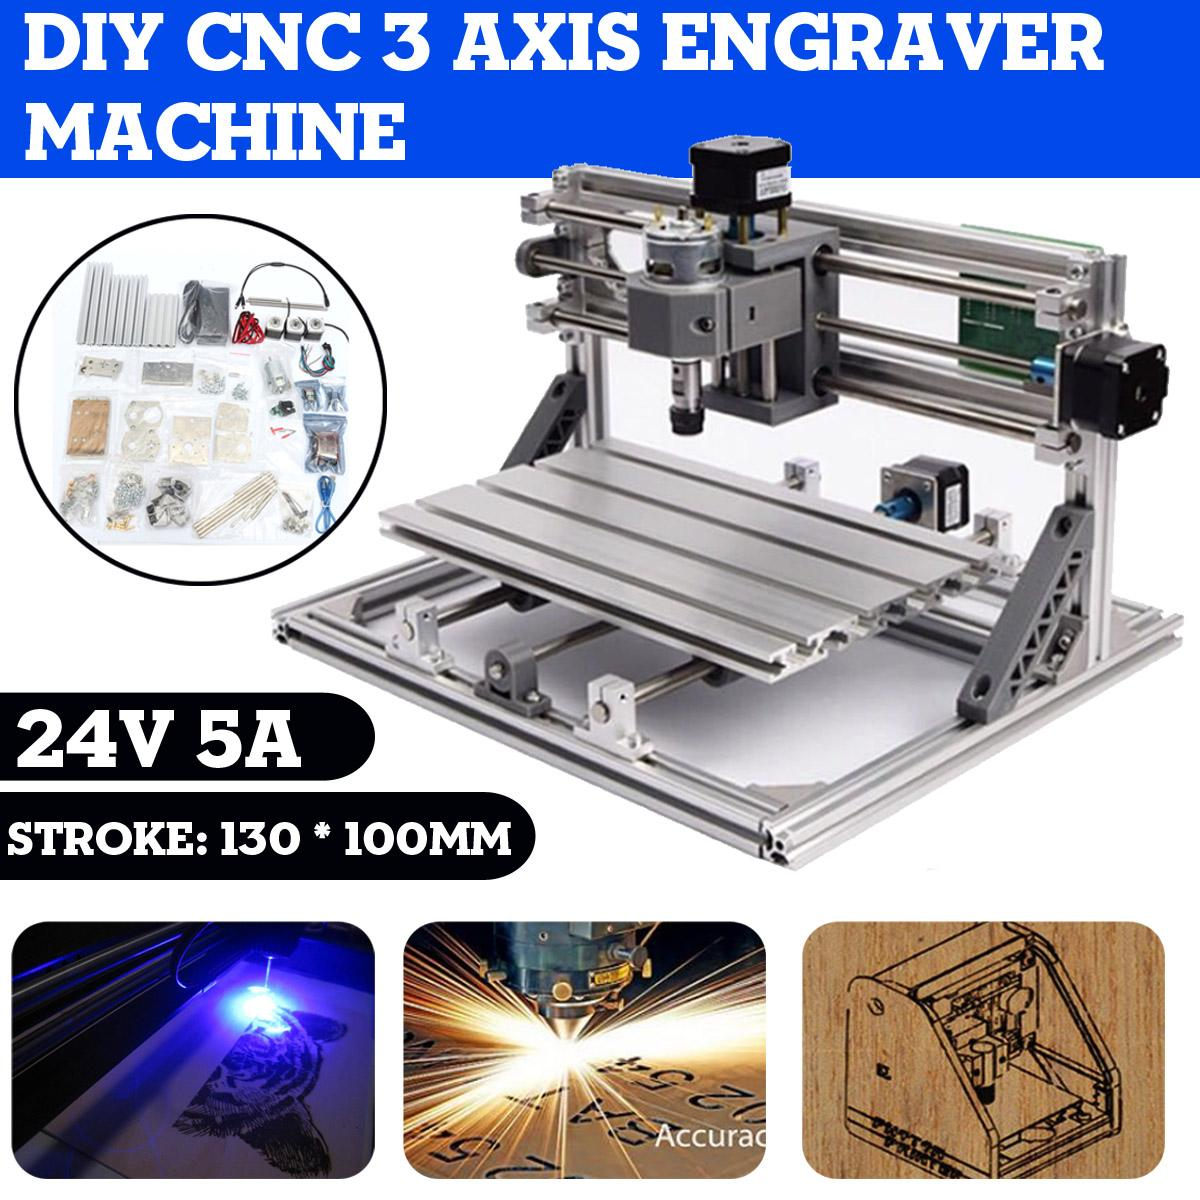 Enrutador CNC DIY, grabador de 3 ejes, máquina de grabado, fresadora de PCB, enrutador de tallado de madera, máquina de grabado láser para tablero Grbl